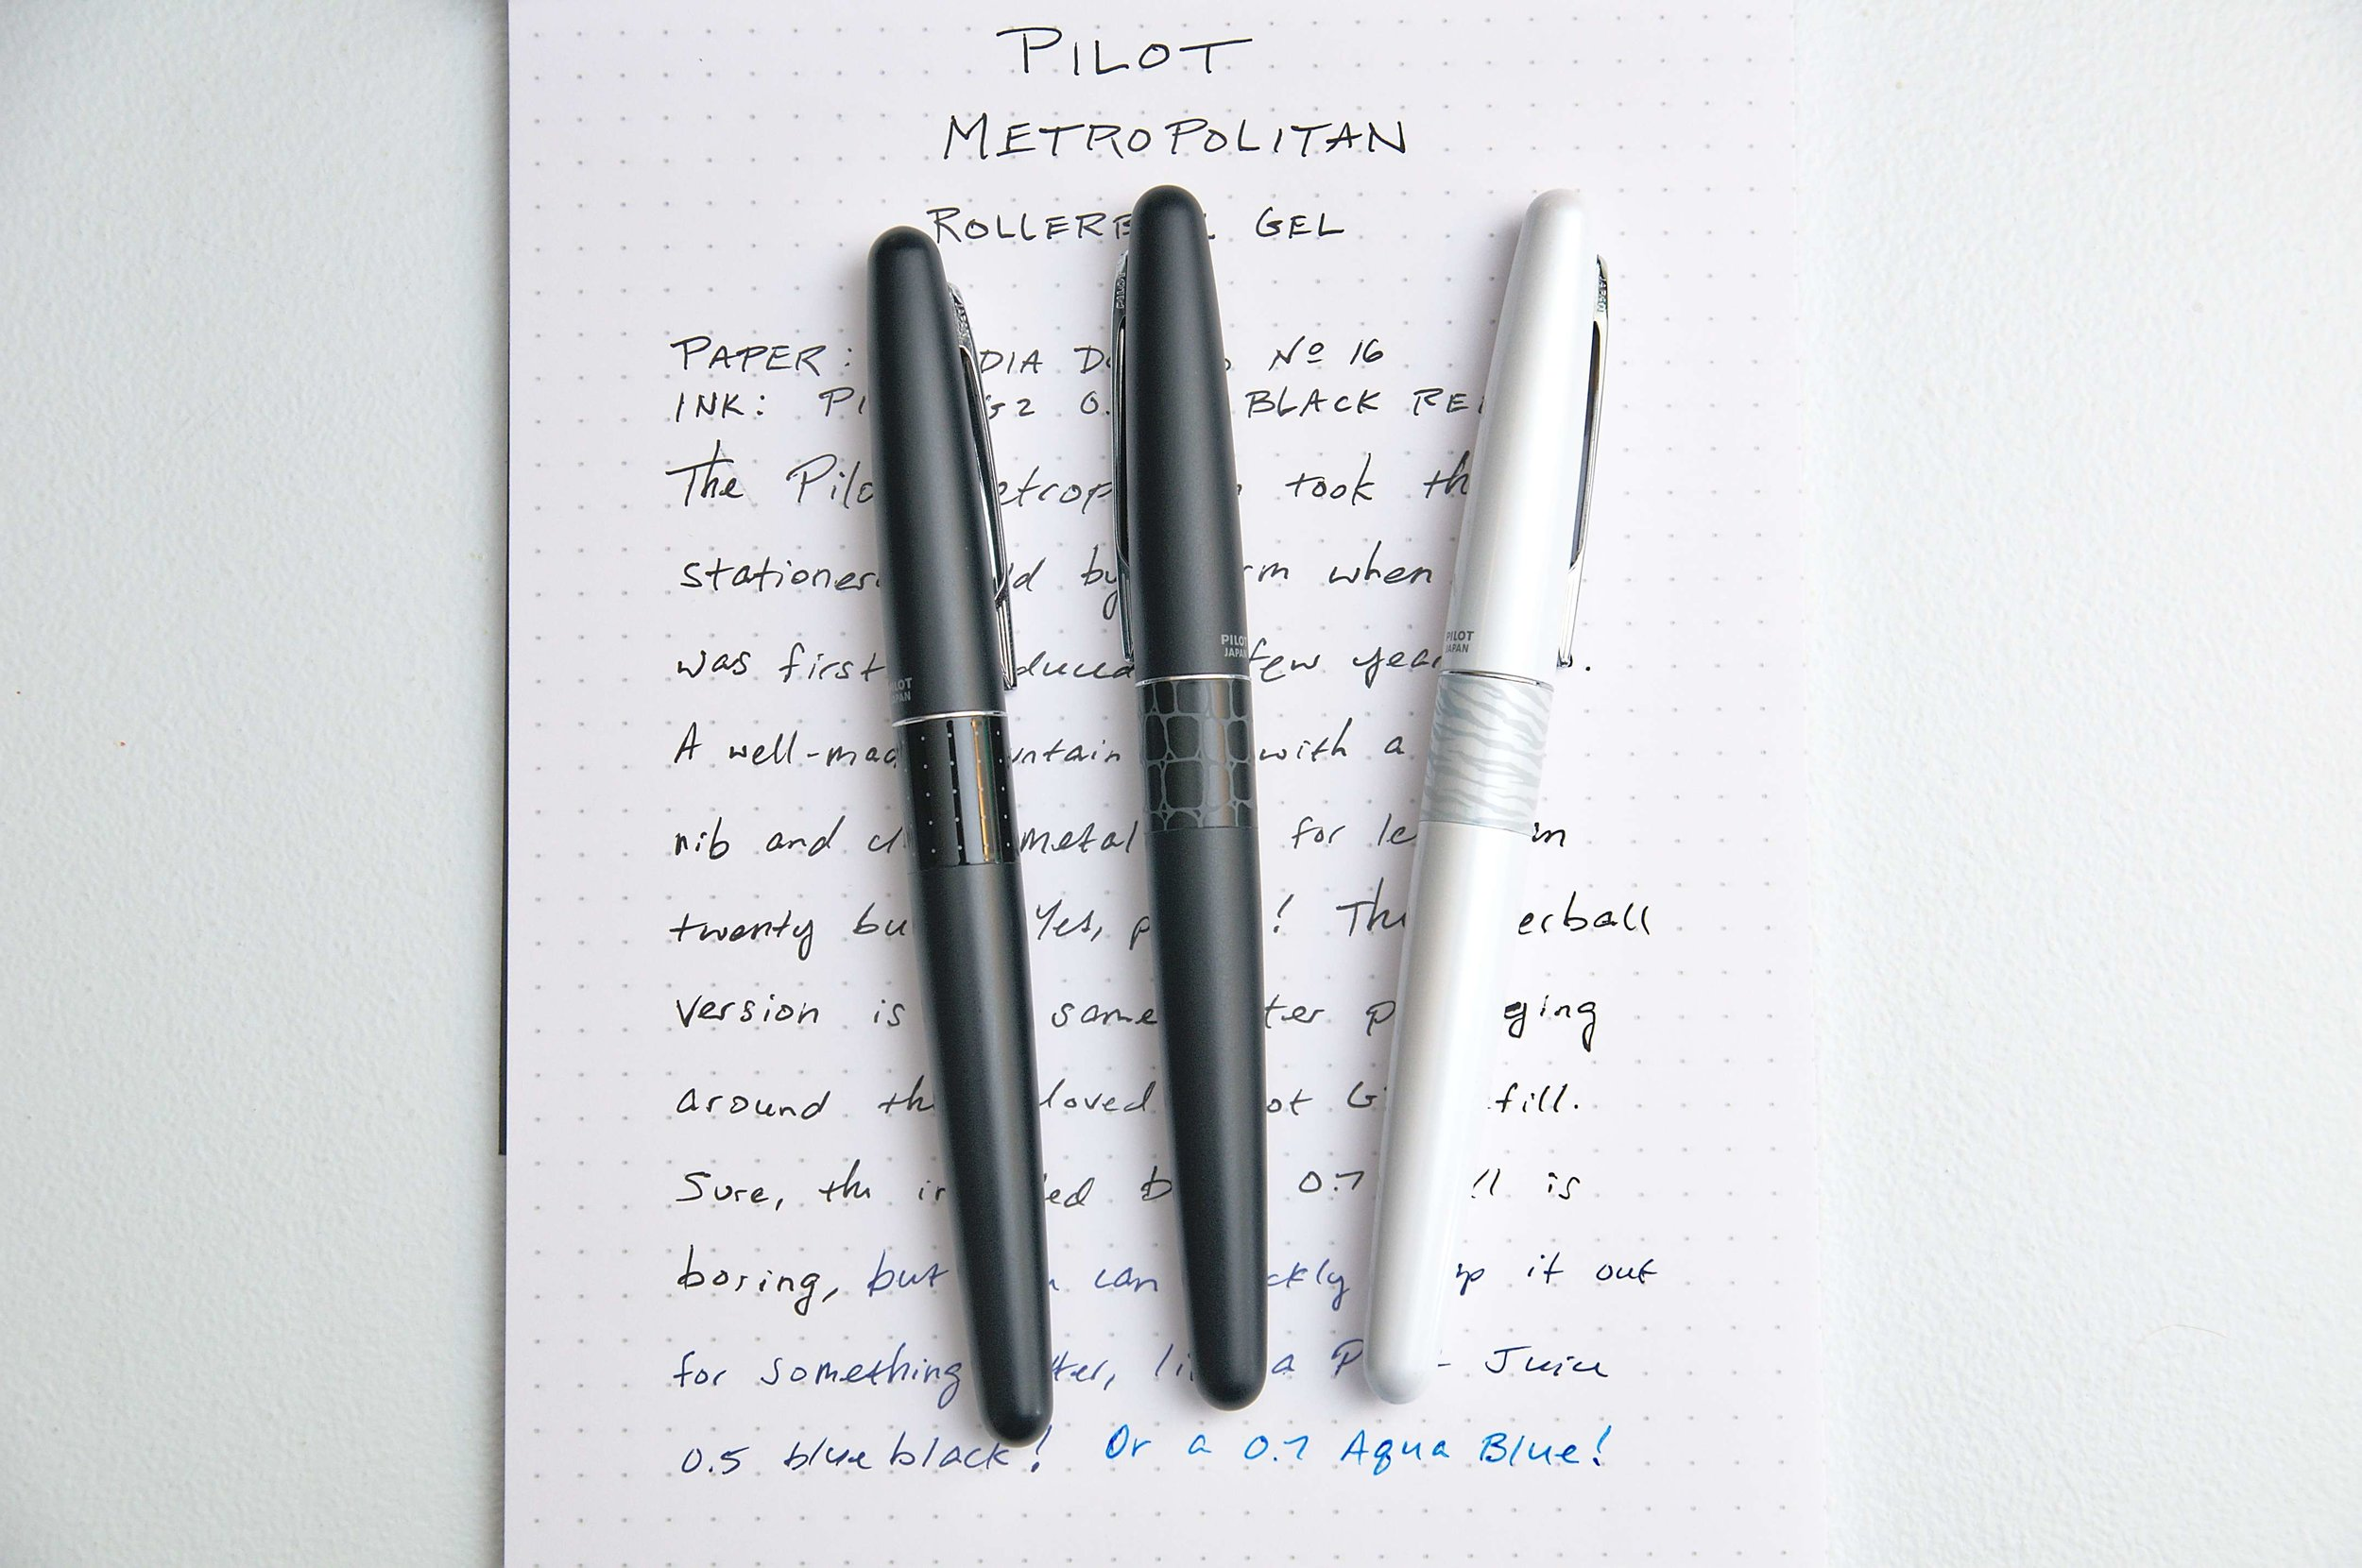 Pilot Metropolitan Rollerball Gel Pen Comparison